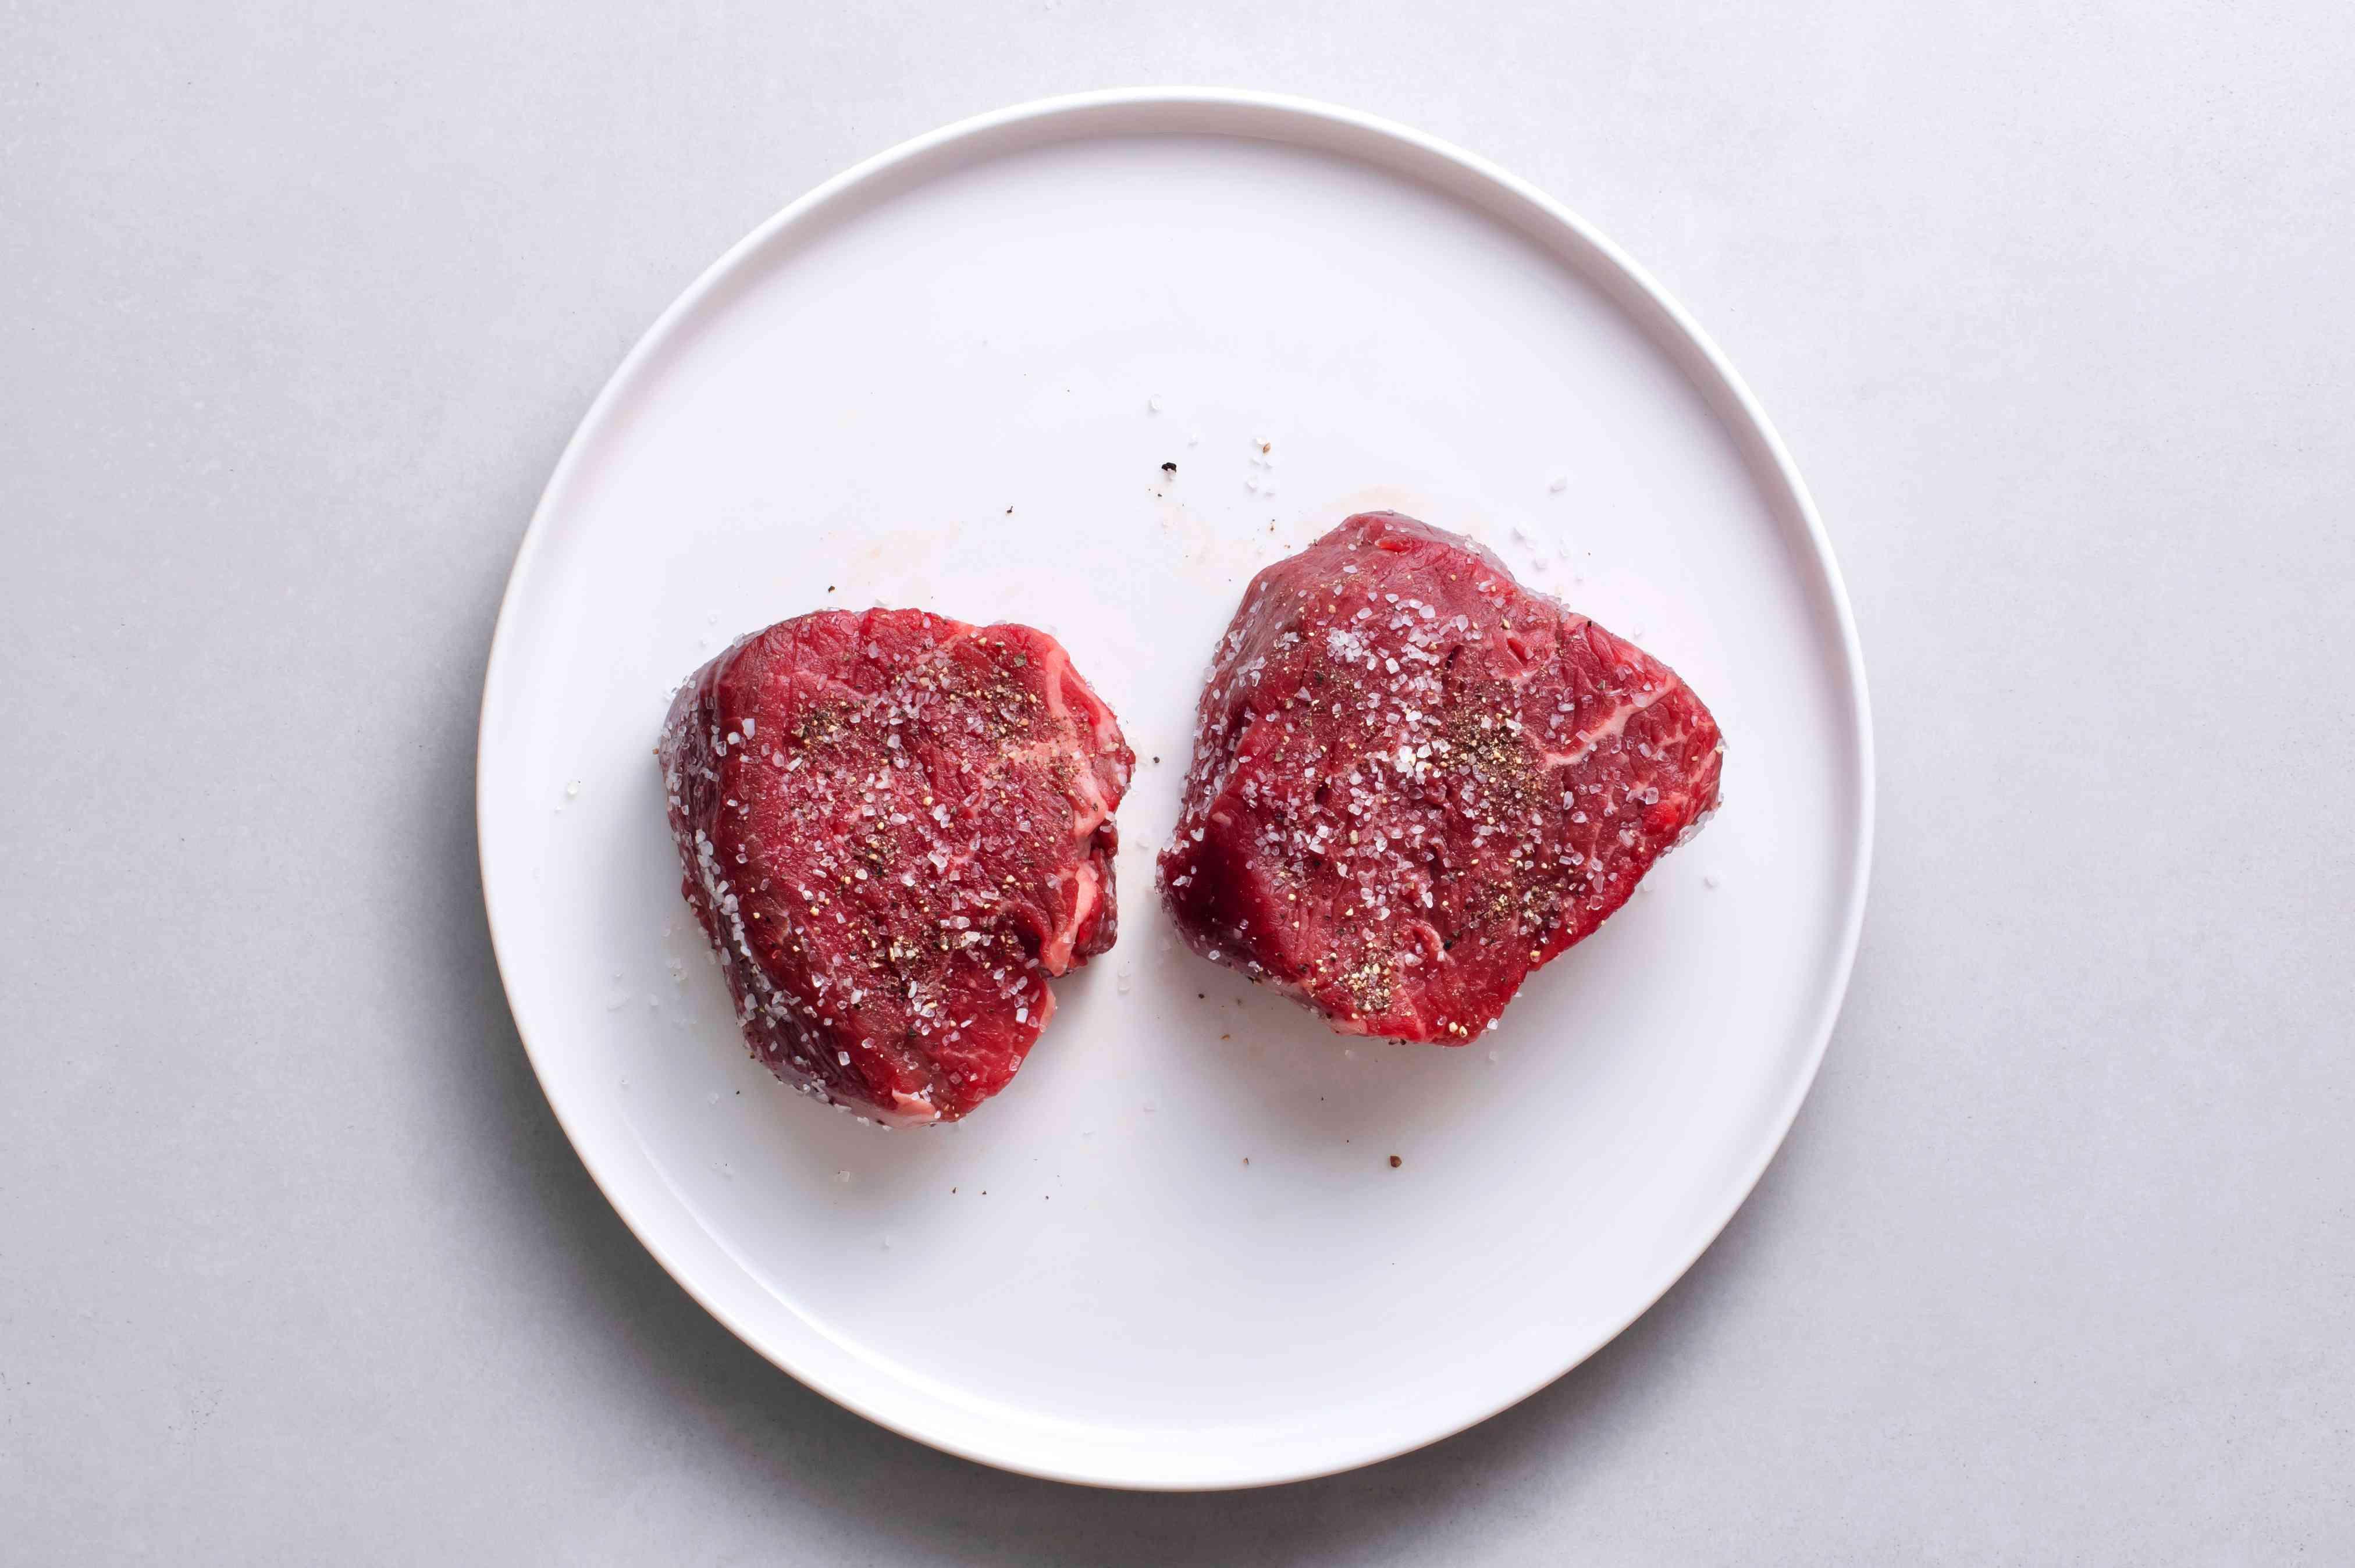 season steak with salt and pepper